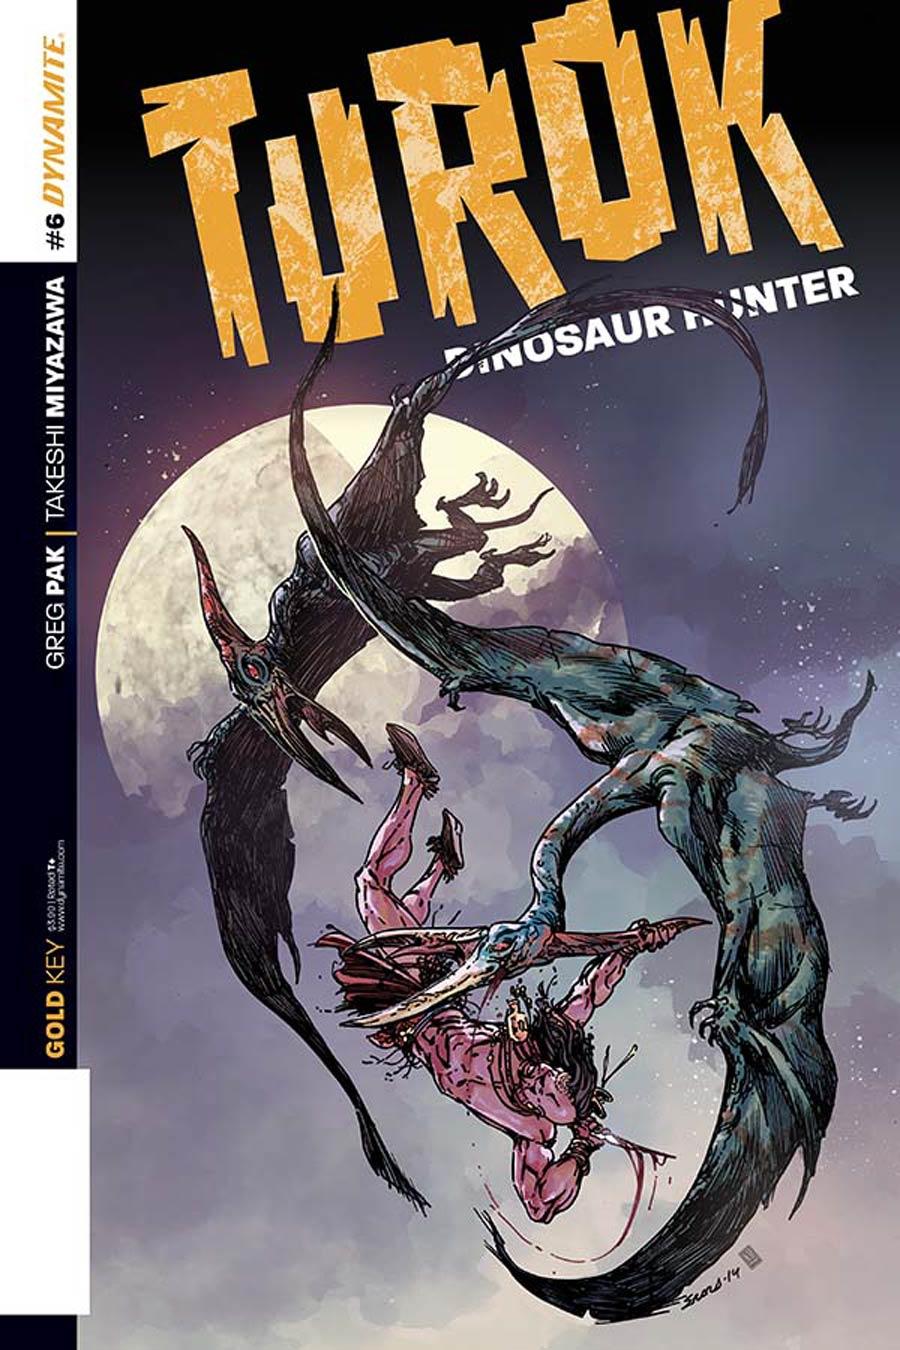 Turok Dinosaur Hunter Vol 2 #6 Cover A Regular Bart Sears Cover